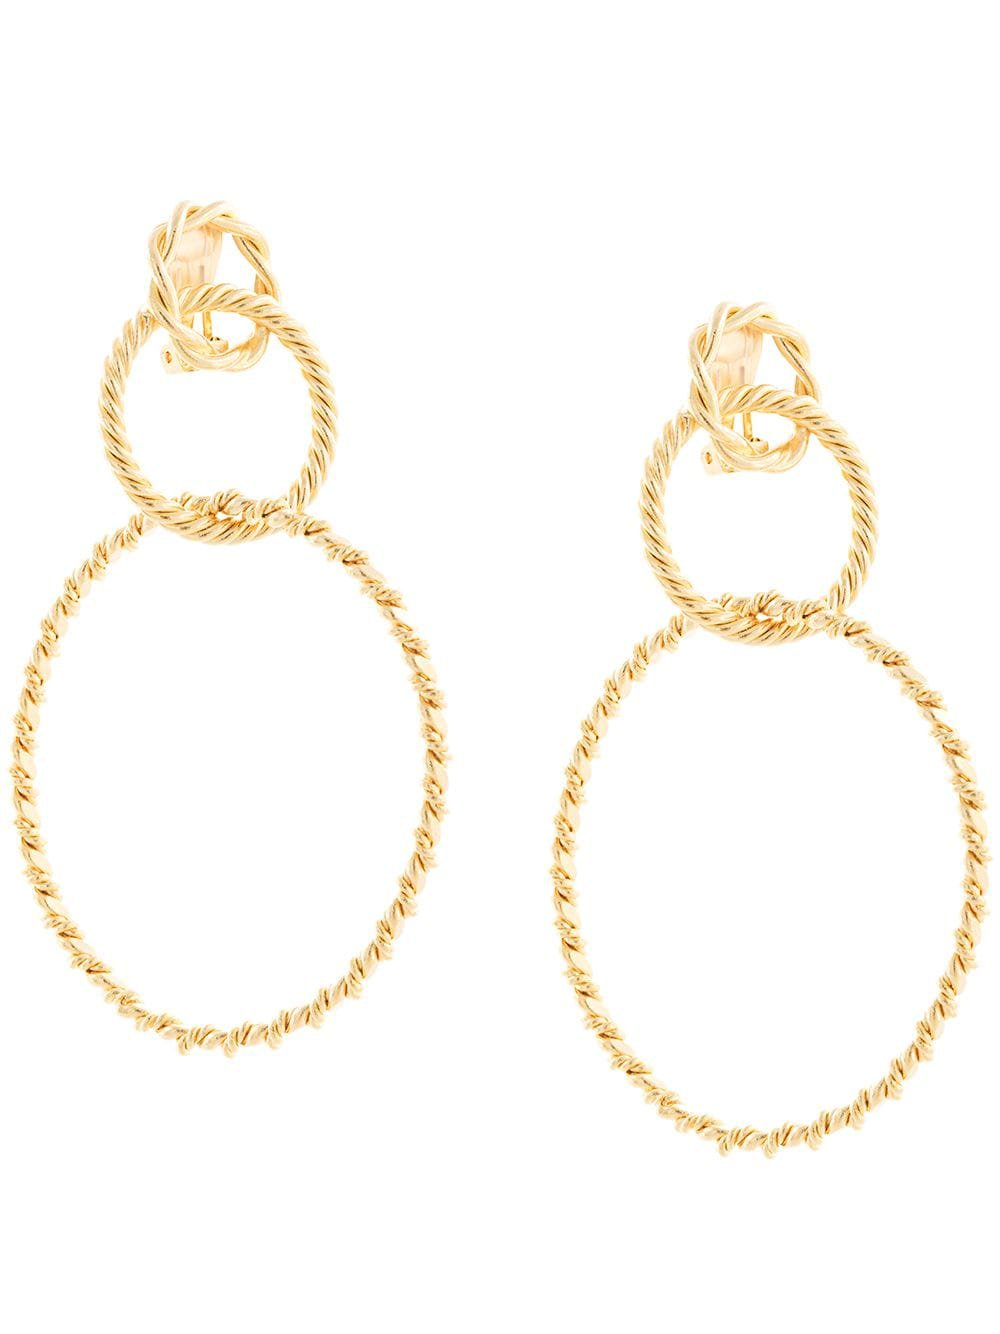 Gold Racil Sienna Hoop Earrings | Farfetch.com